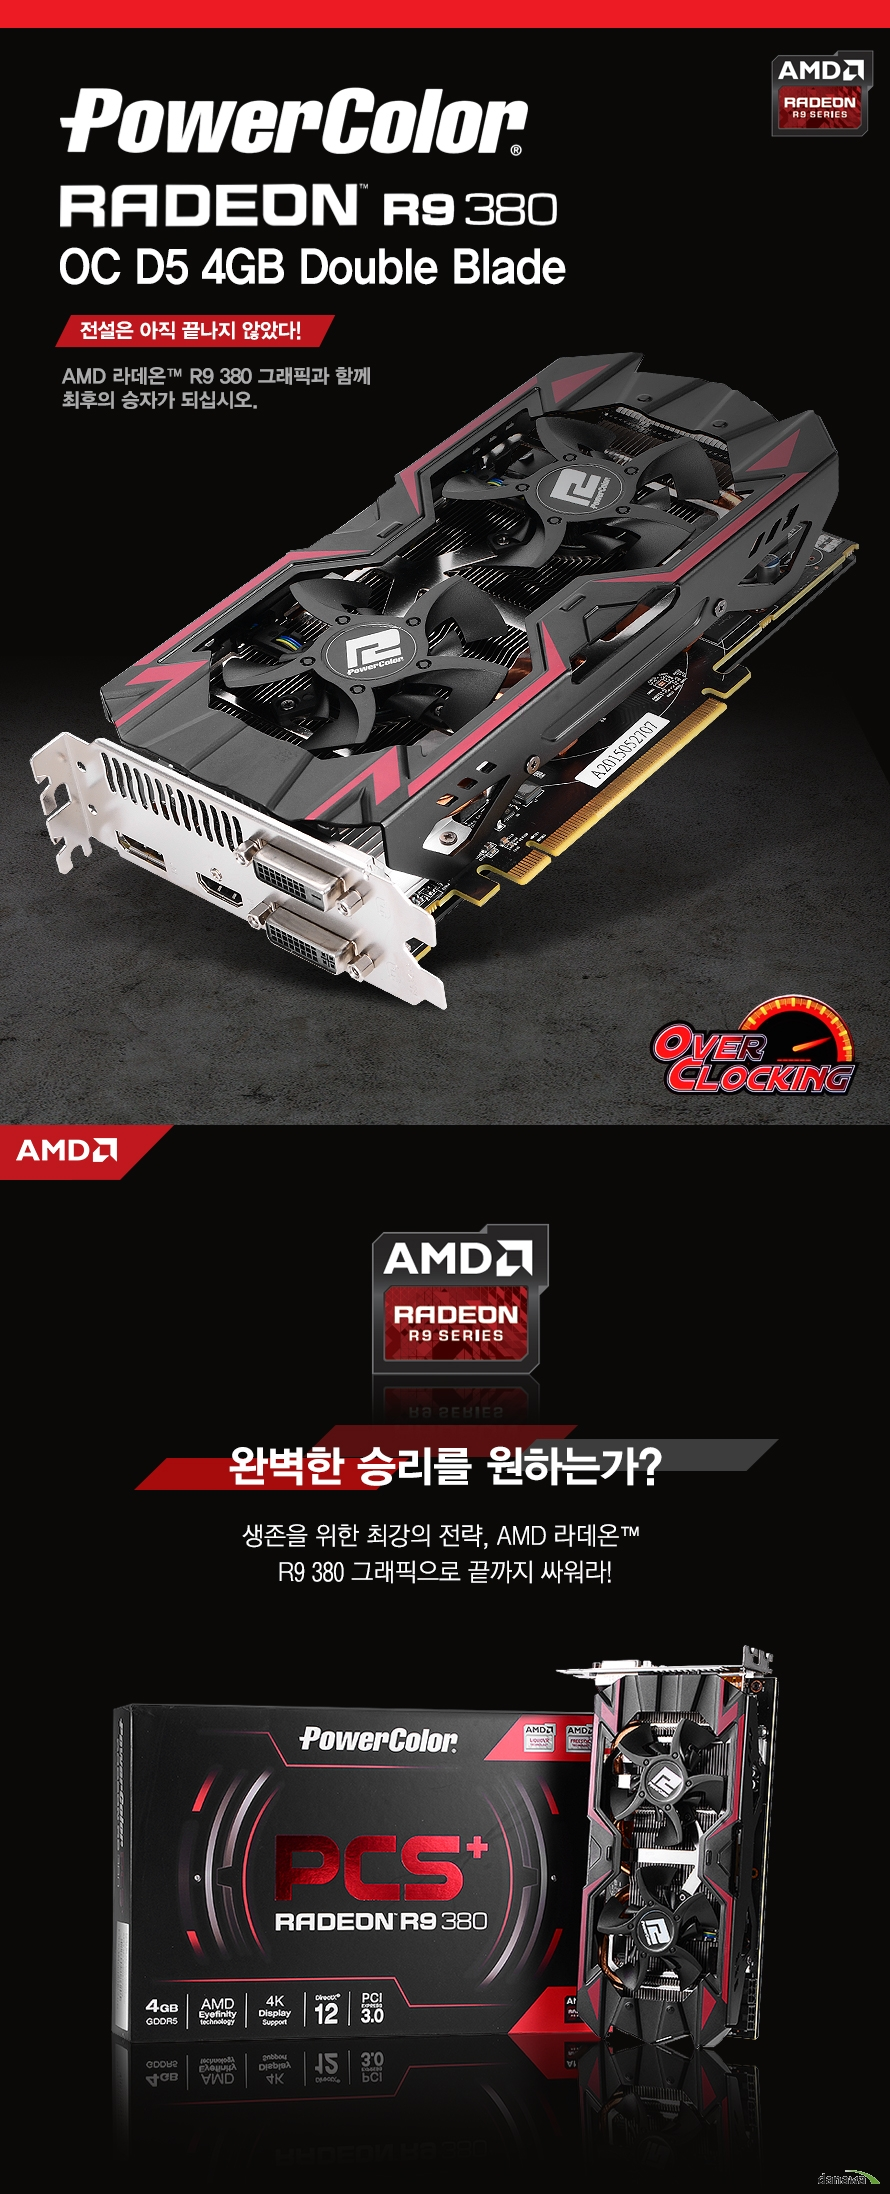 PowerColor 라데온 R9 380 OD D5 4GB Dual Blade